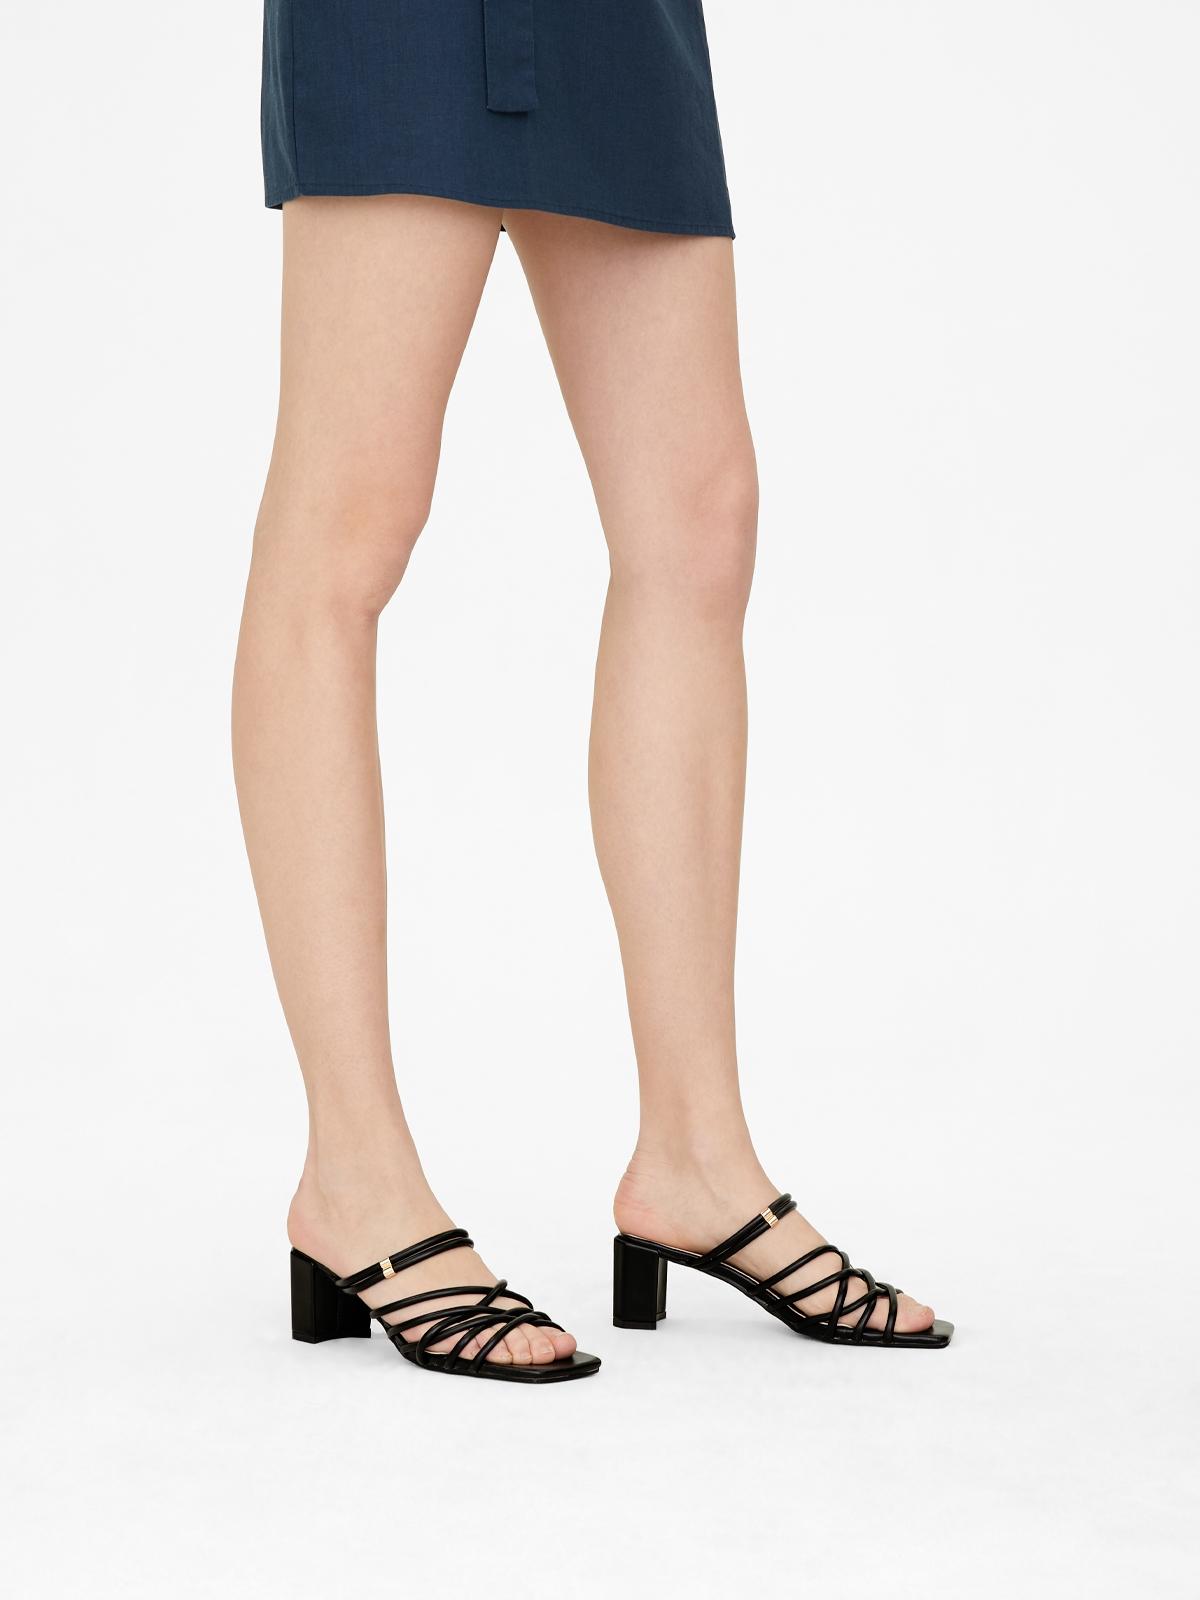 Rocket Strappy Squared Toe Heels Black